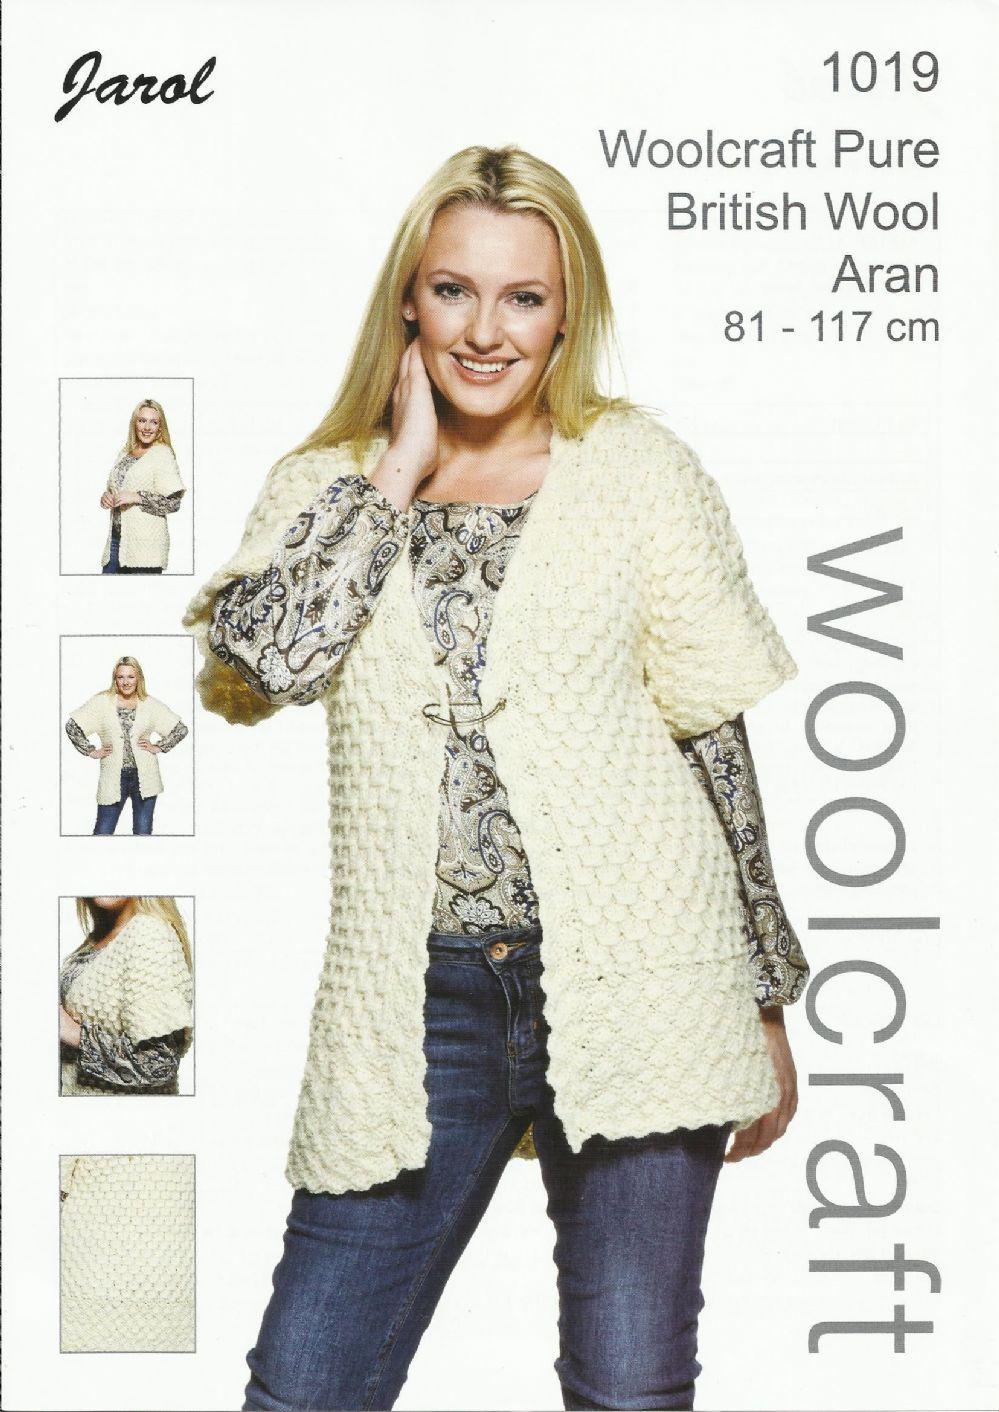 777a22ef1 30 Awesome Image of Aran Knitting Patterns Free . Aran Knitting Patterns  Free Woolcraft Ladies Waistcoat Aran Knitting Pattern 1019